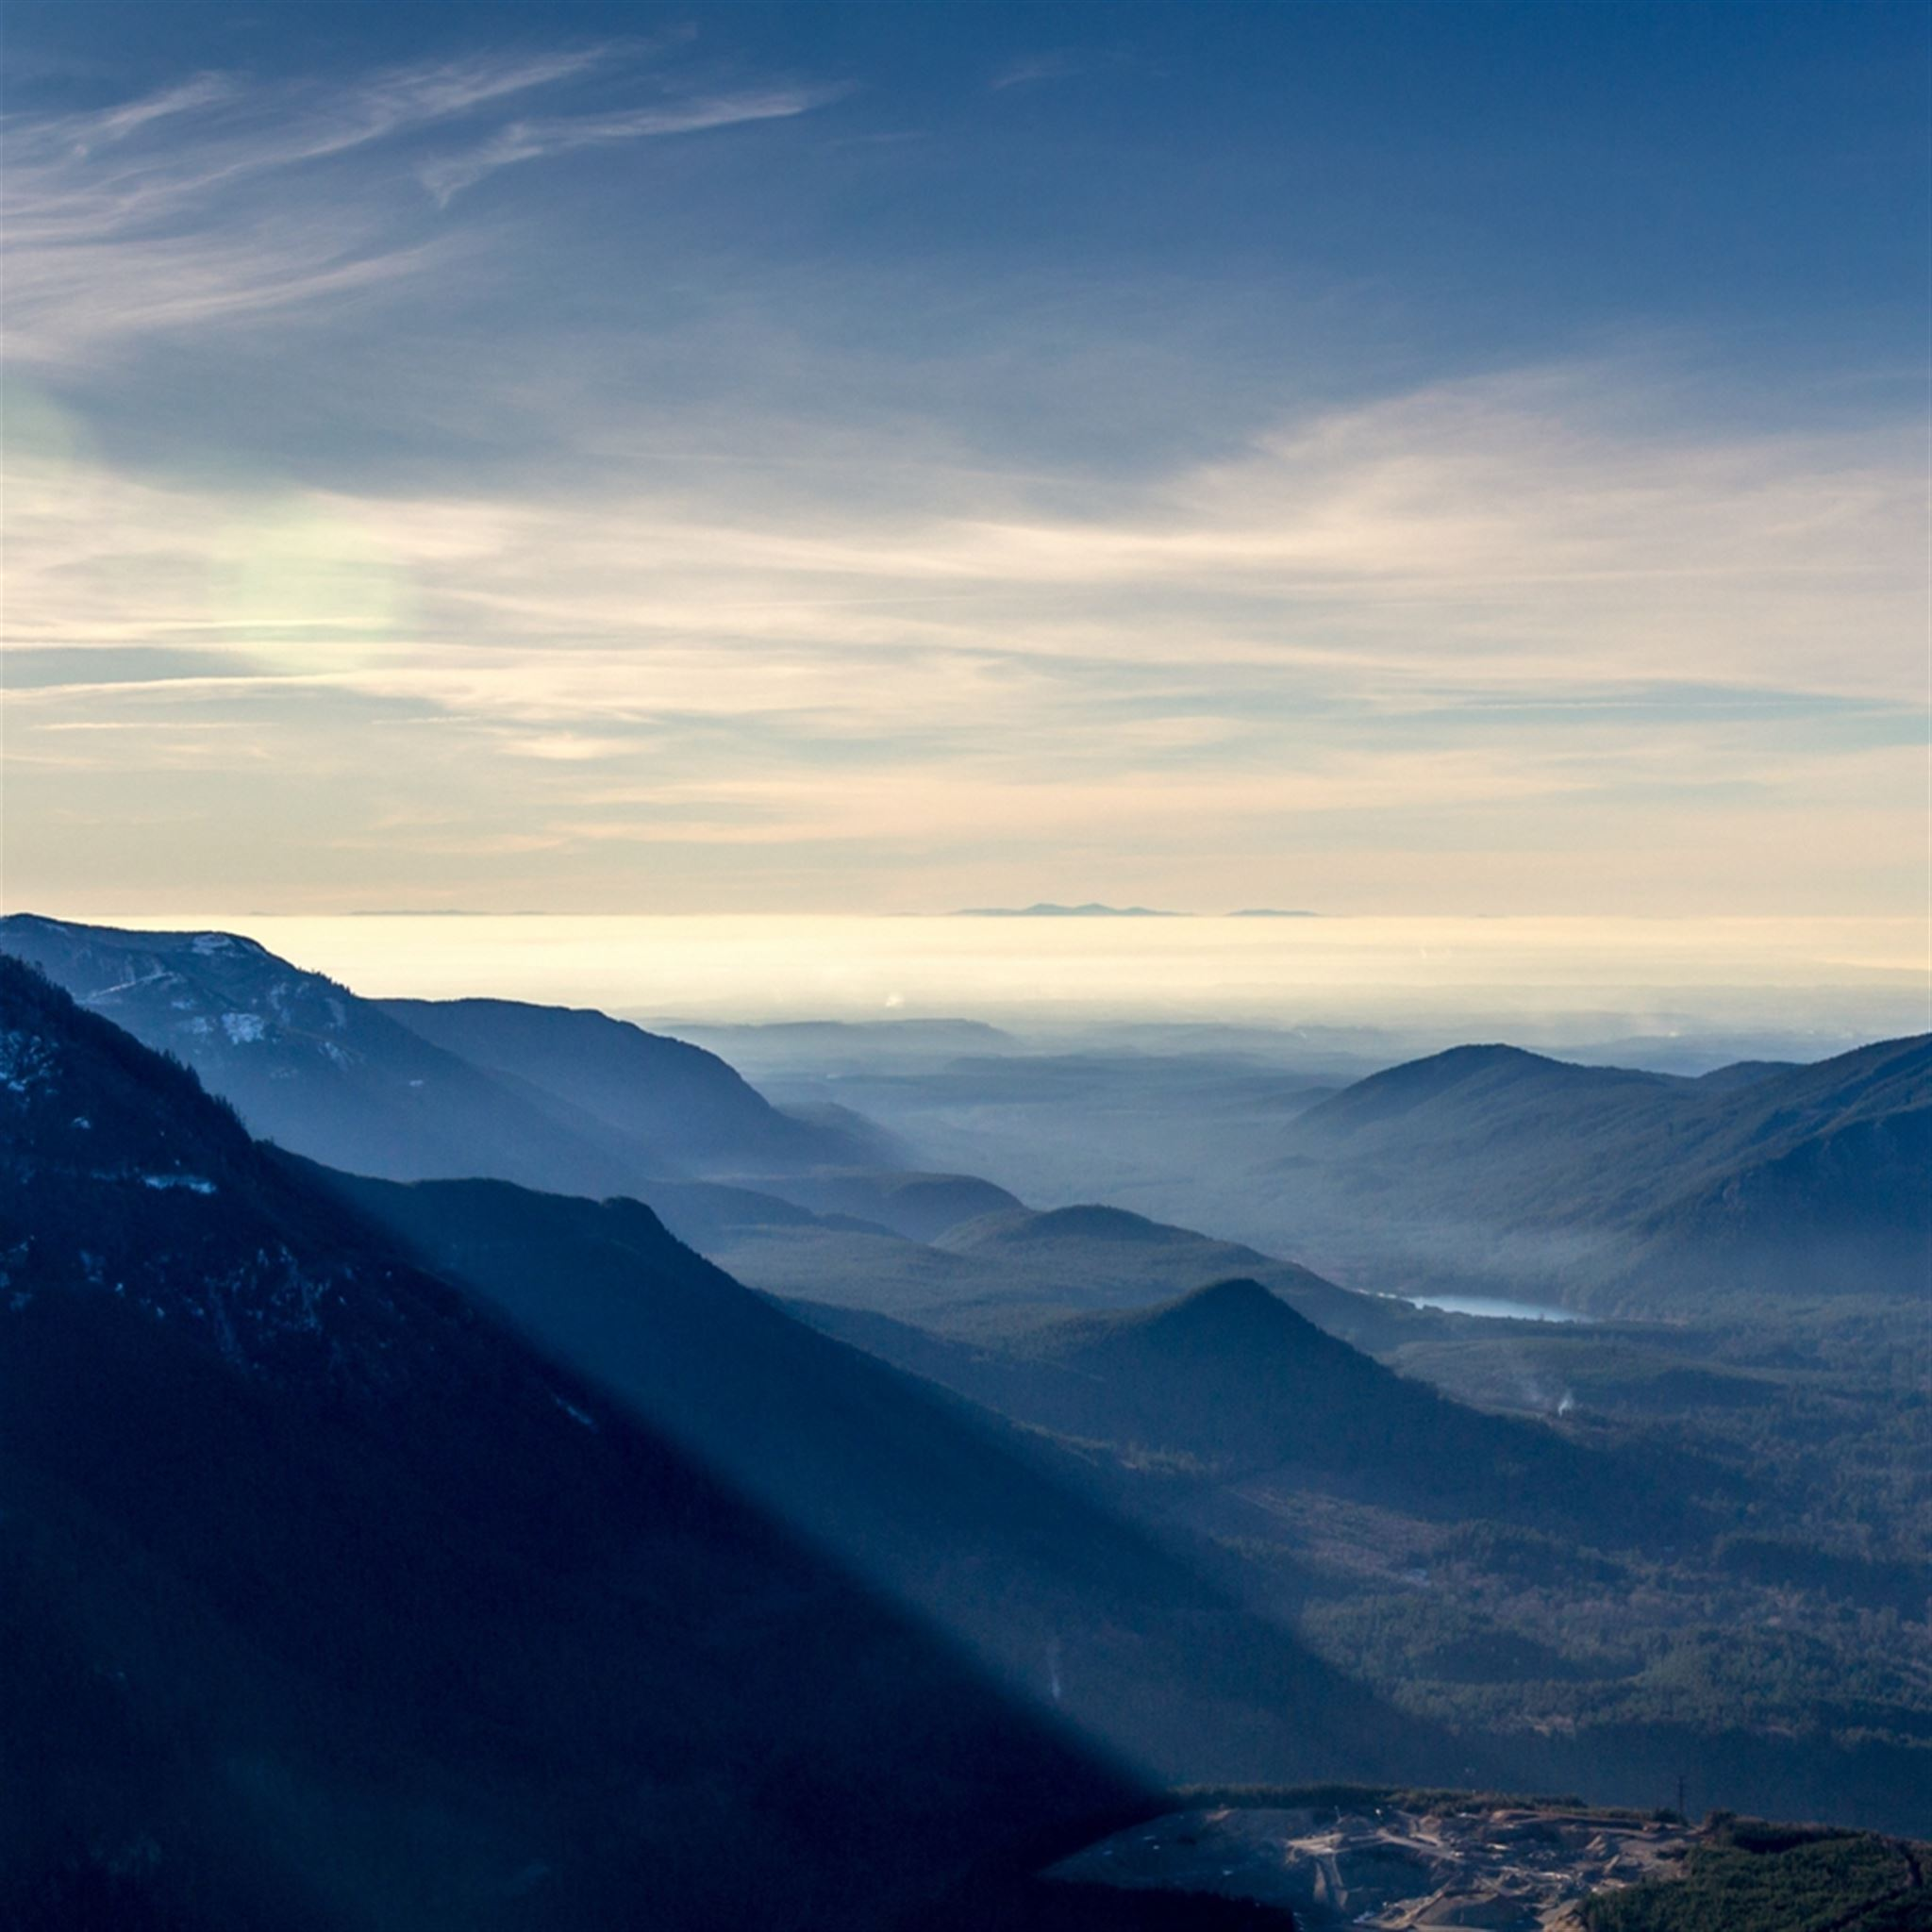 Mountains Sky Mist Sunny Scenery iPad wallpaper